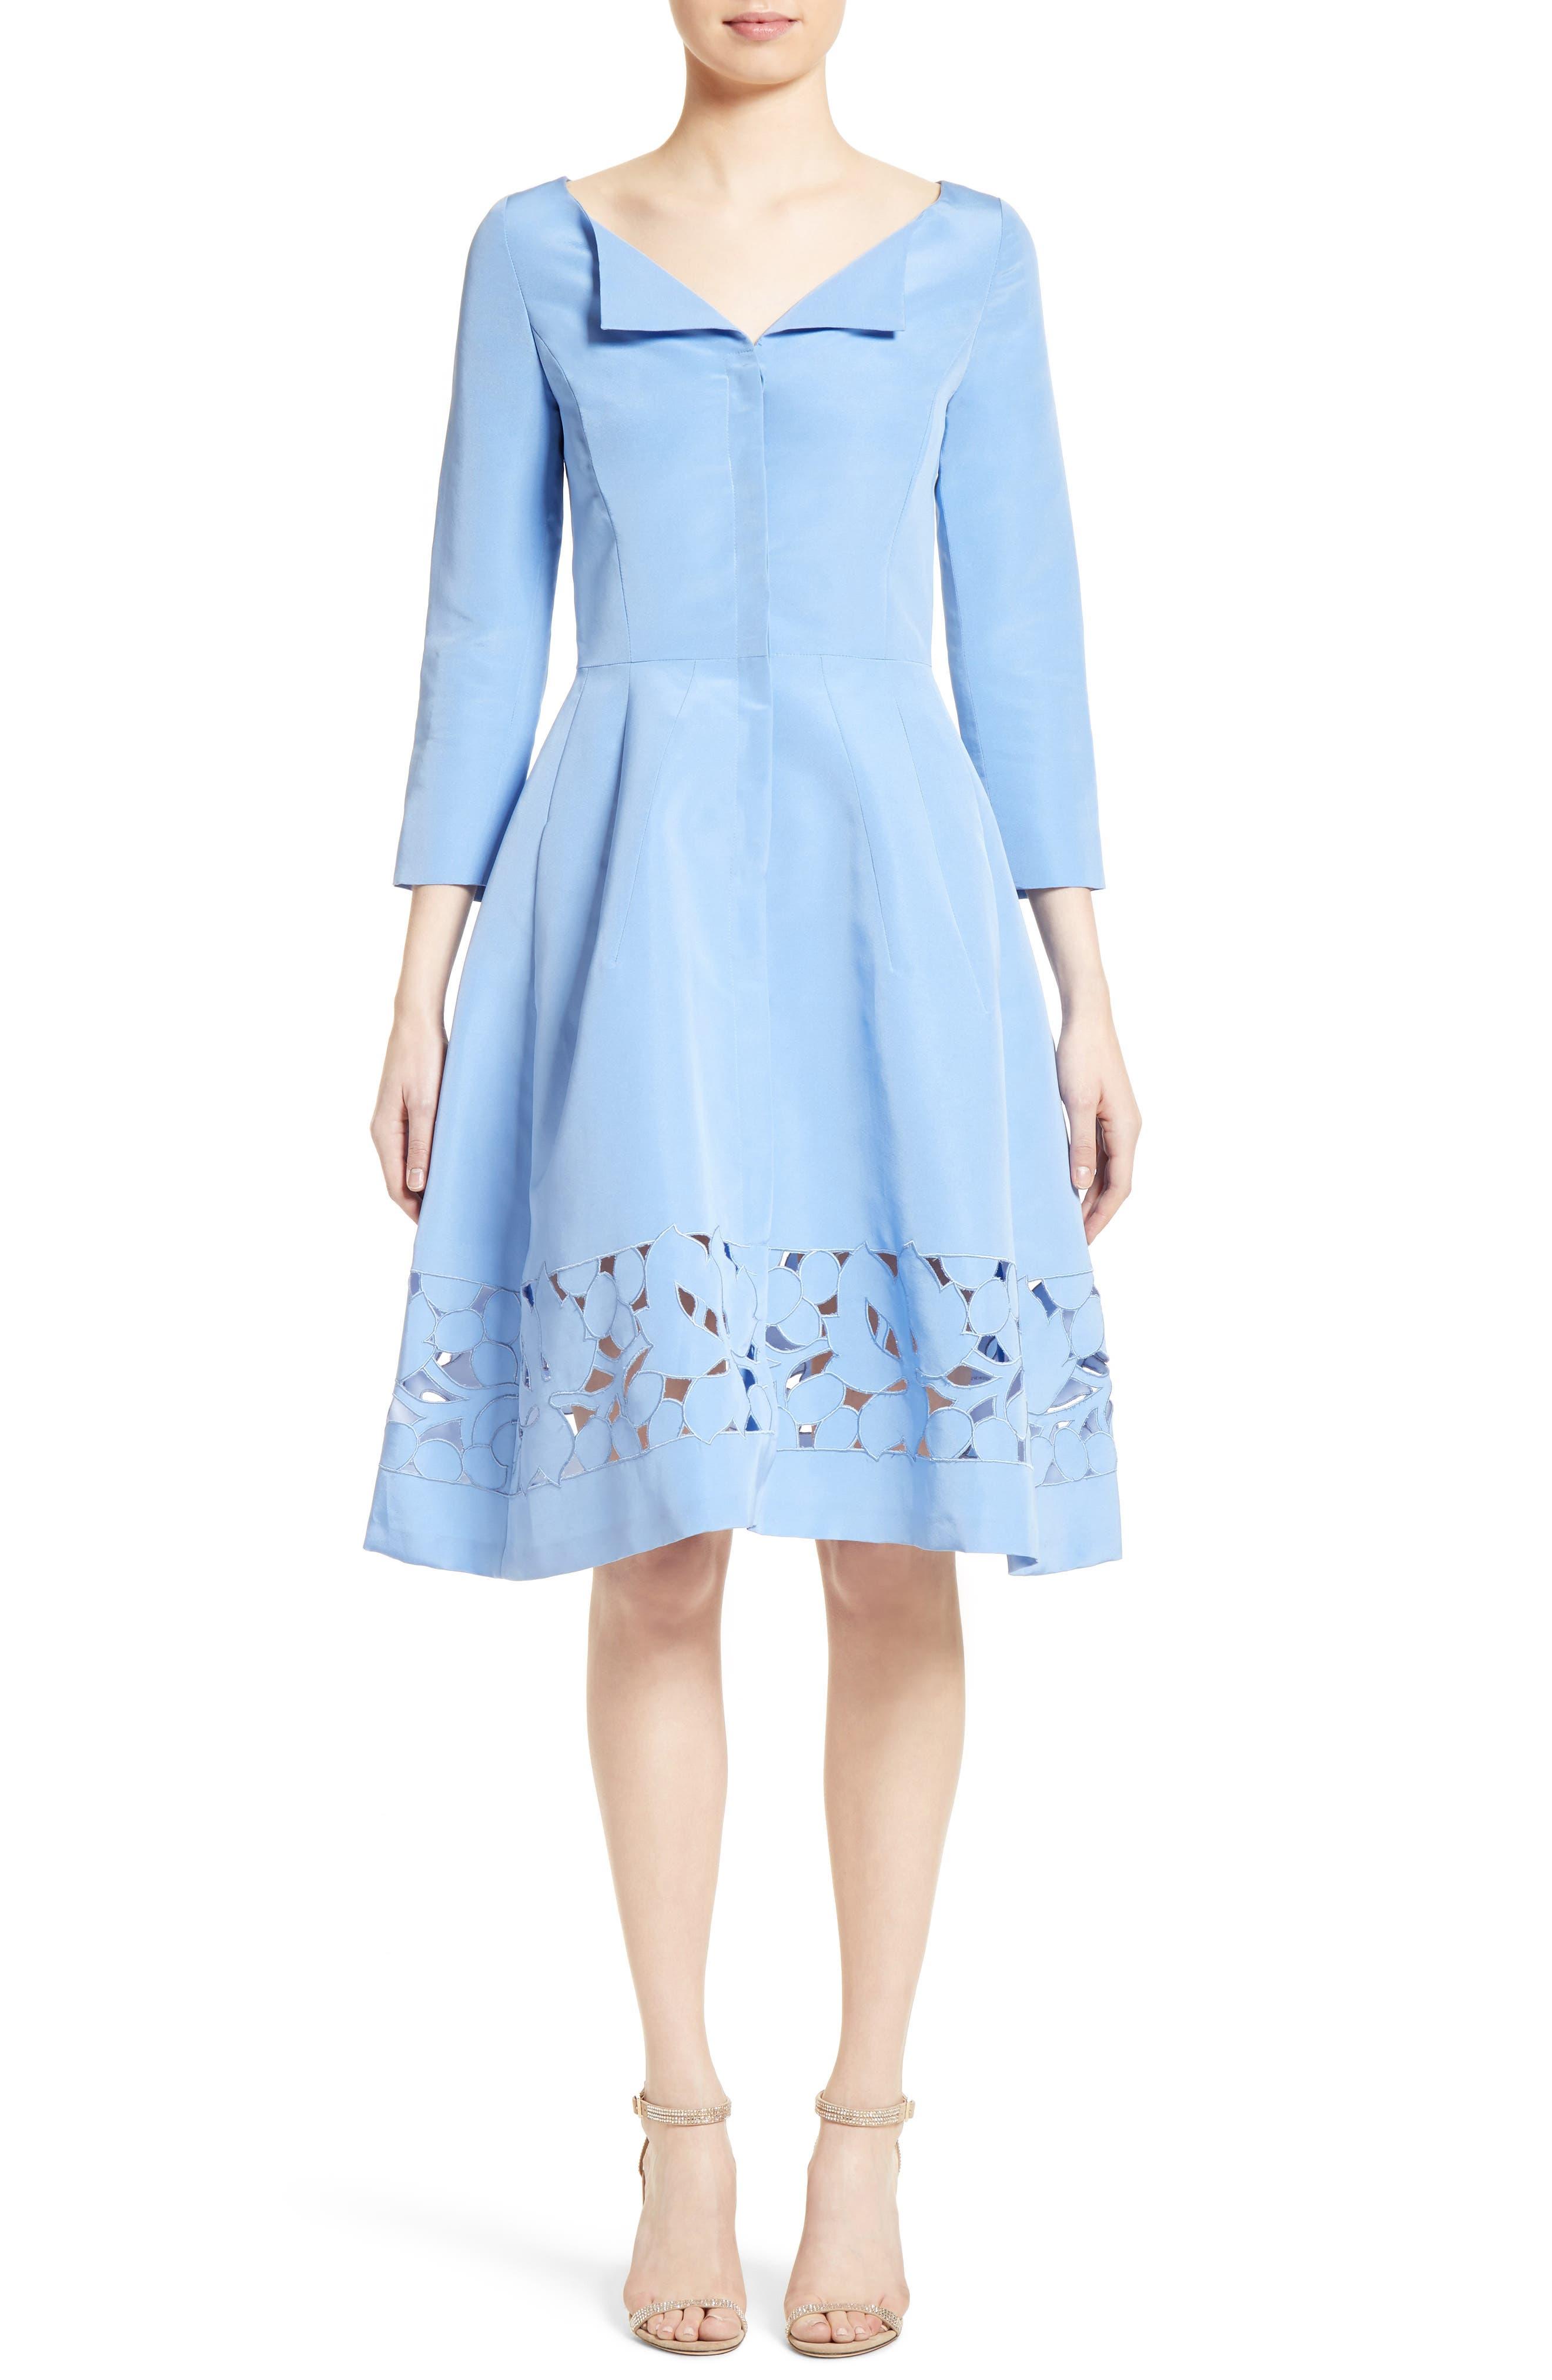 Carolina Herrerra Laser Cut Eyelet Button Front Dress,                             Alternate thumbnail 5, color,                             400